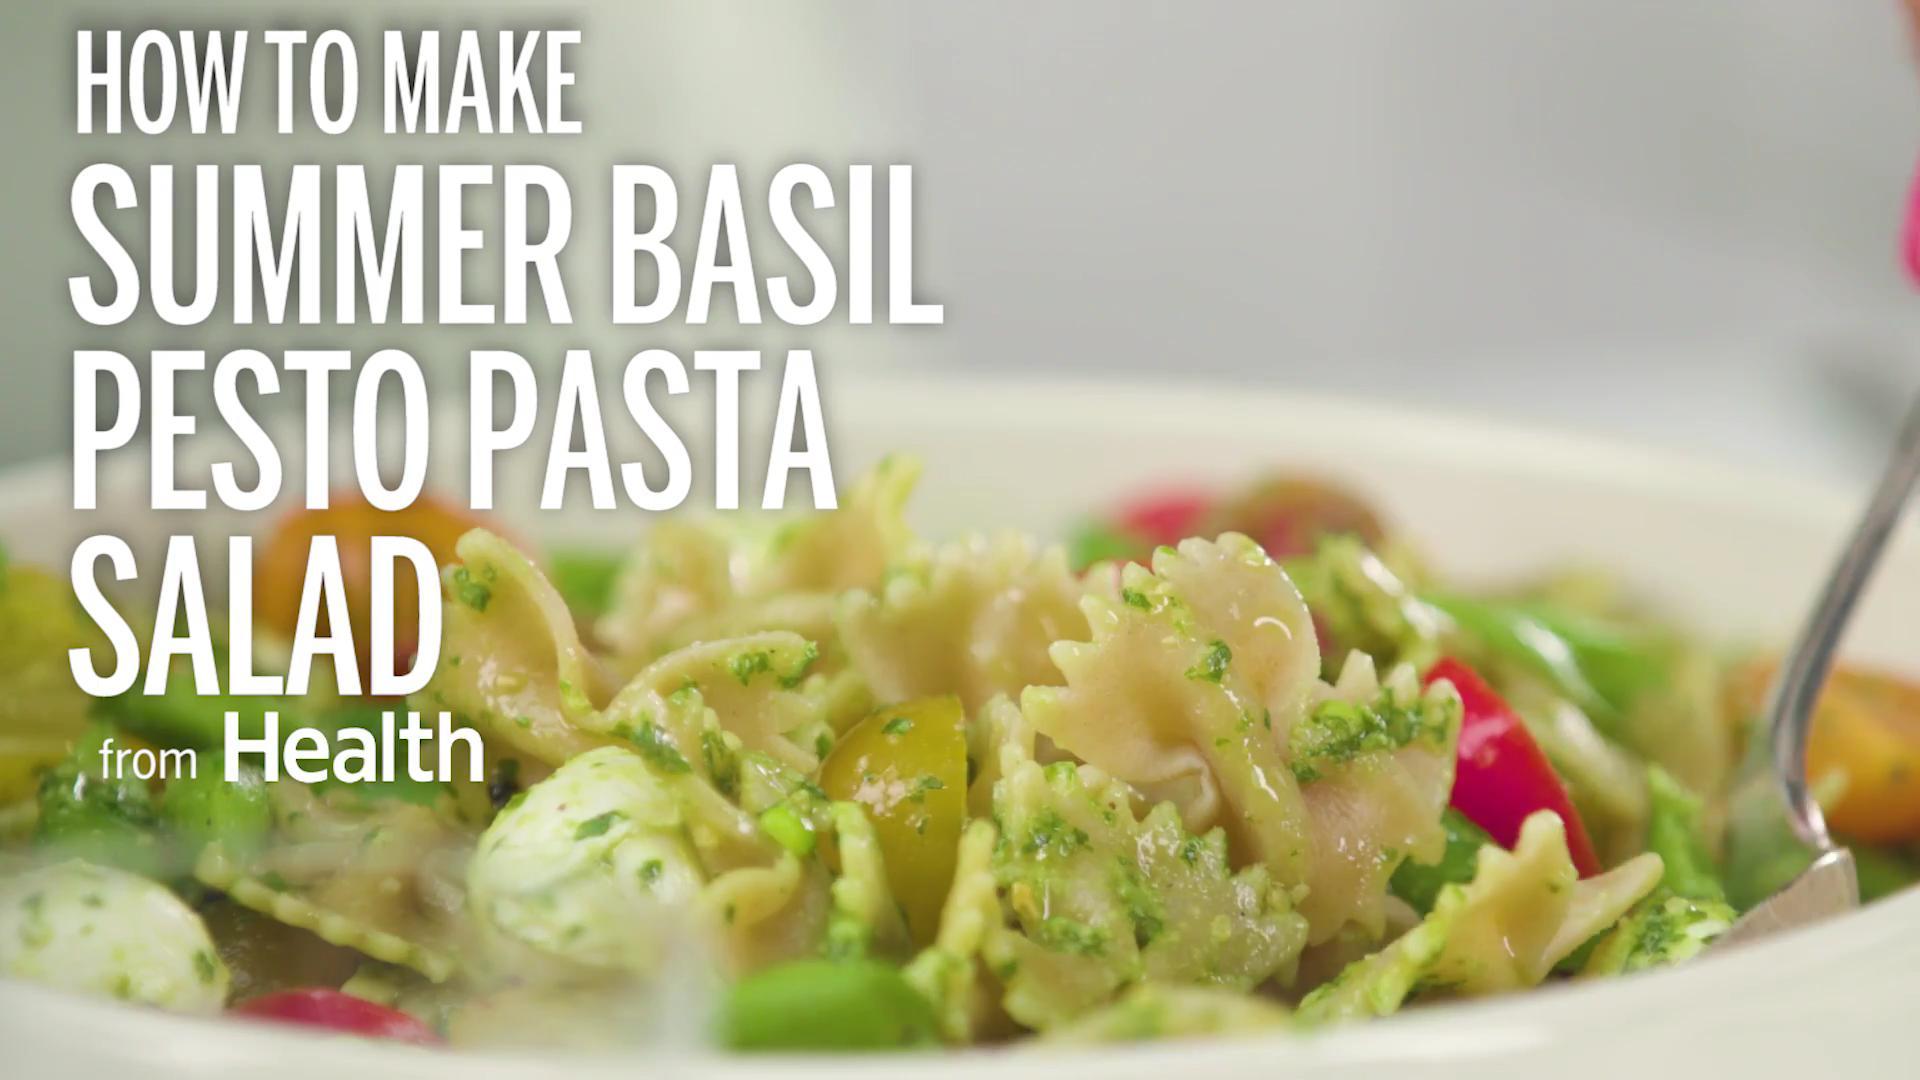 Summer Basil Pesto Pasta Salad Recipe - Health